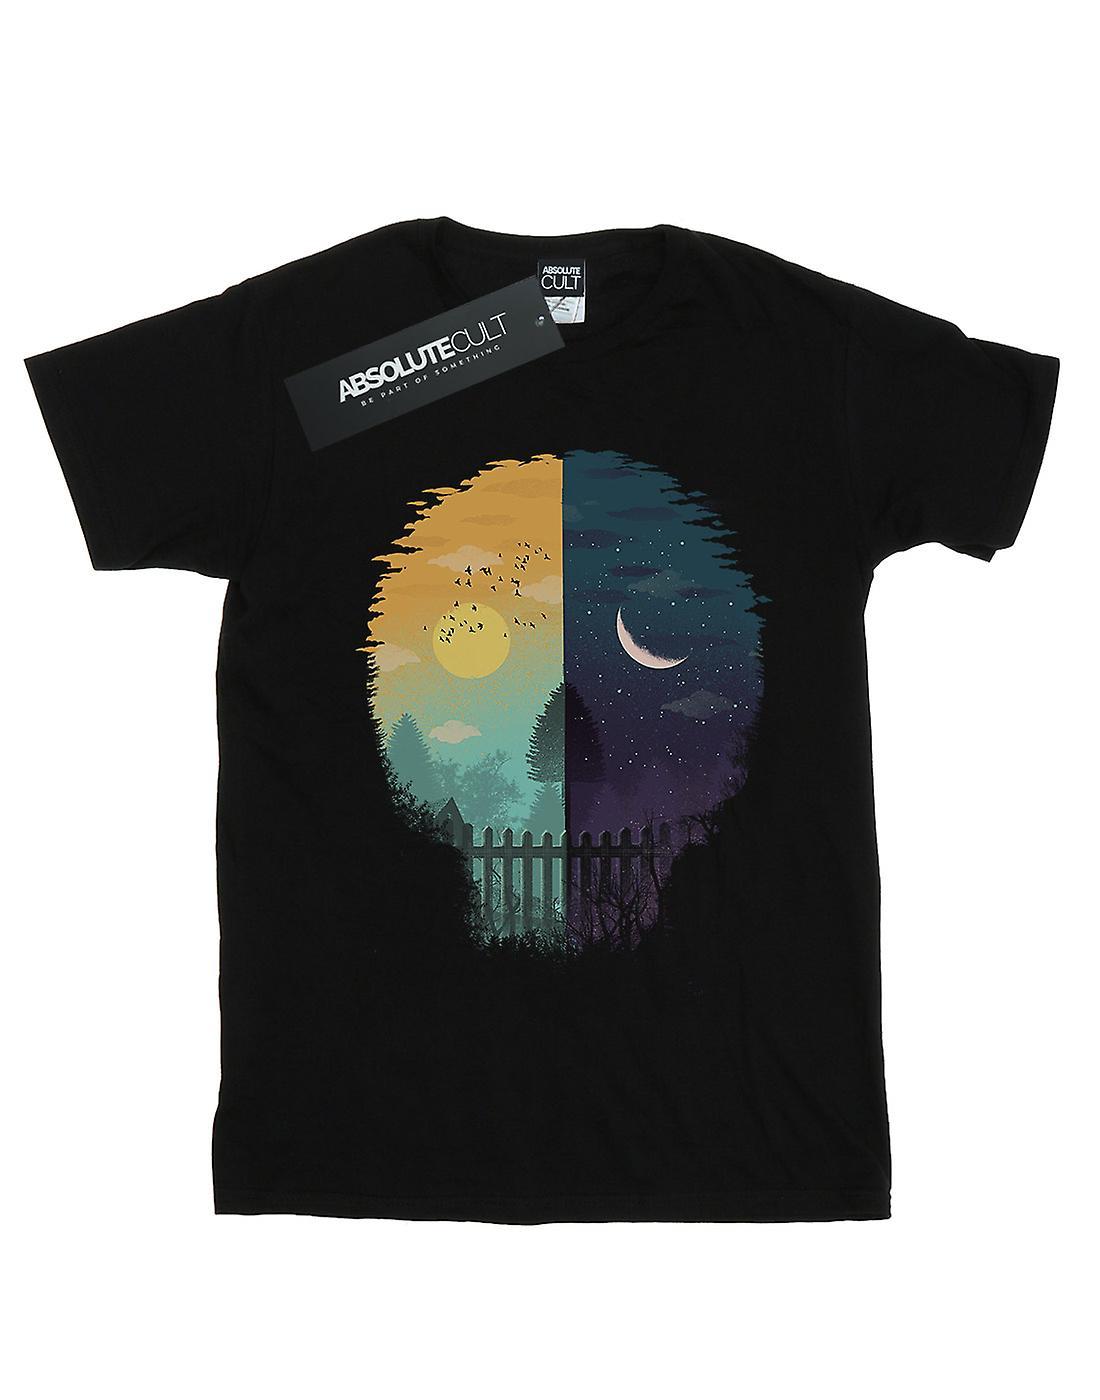 Dan Dingeroz Boys Night And Day T-Shirt